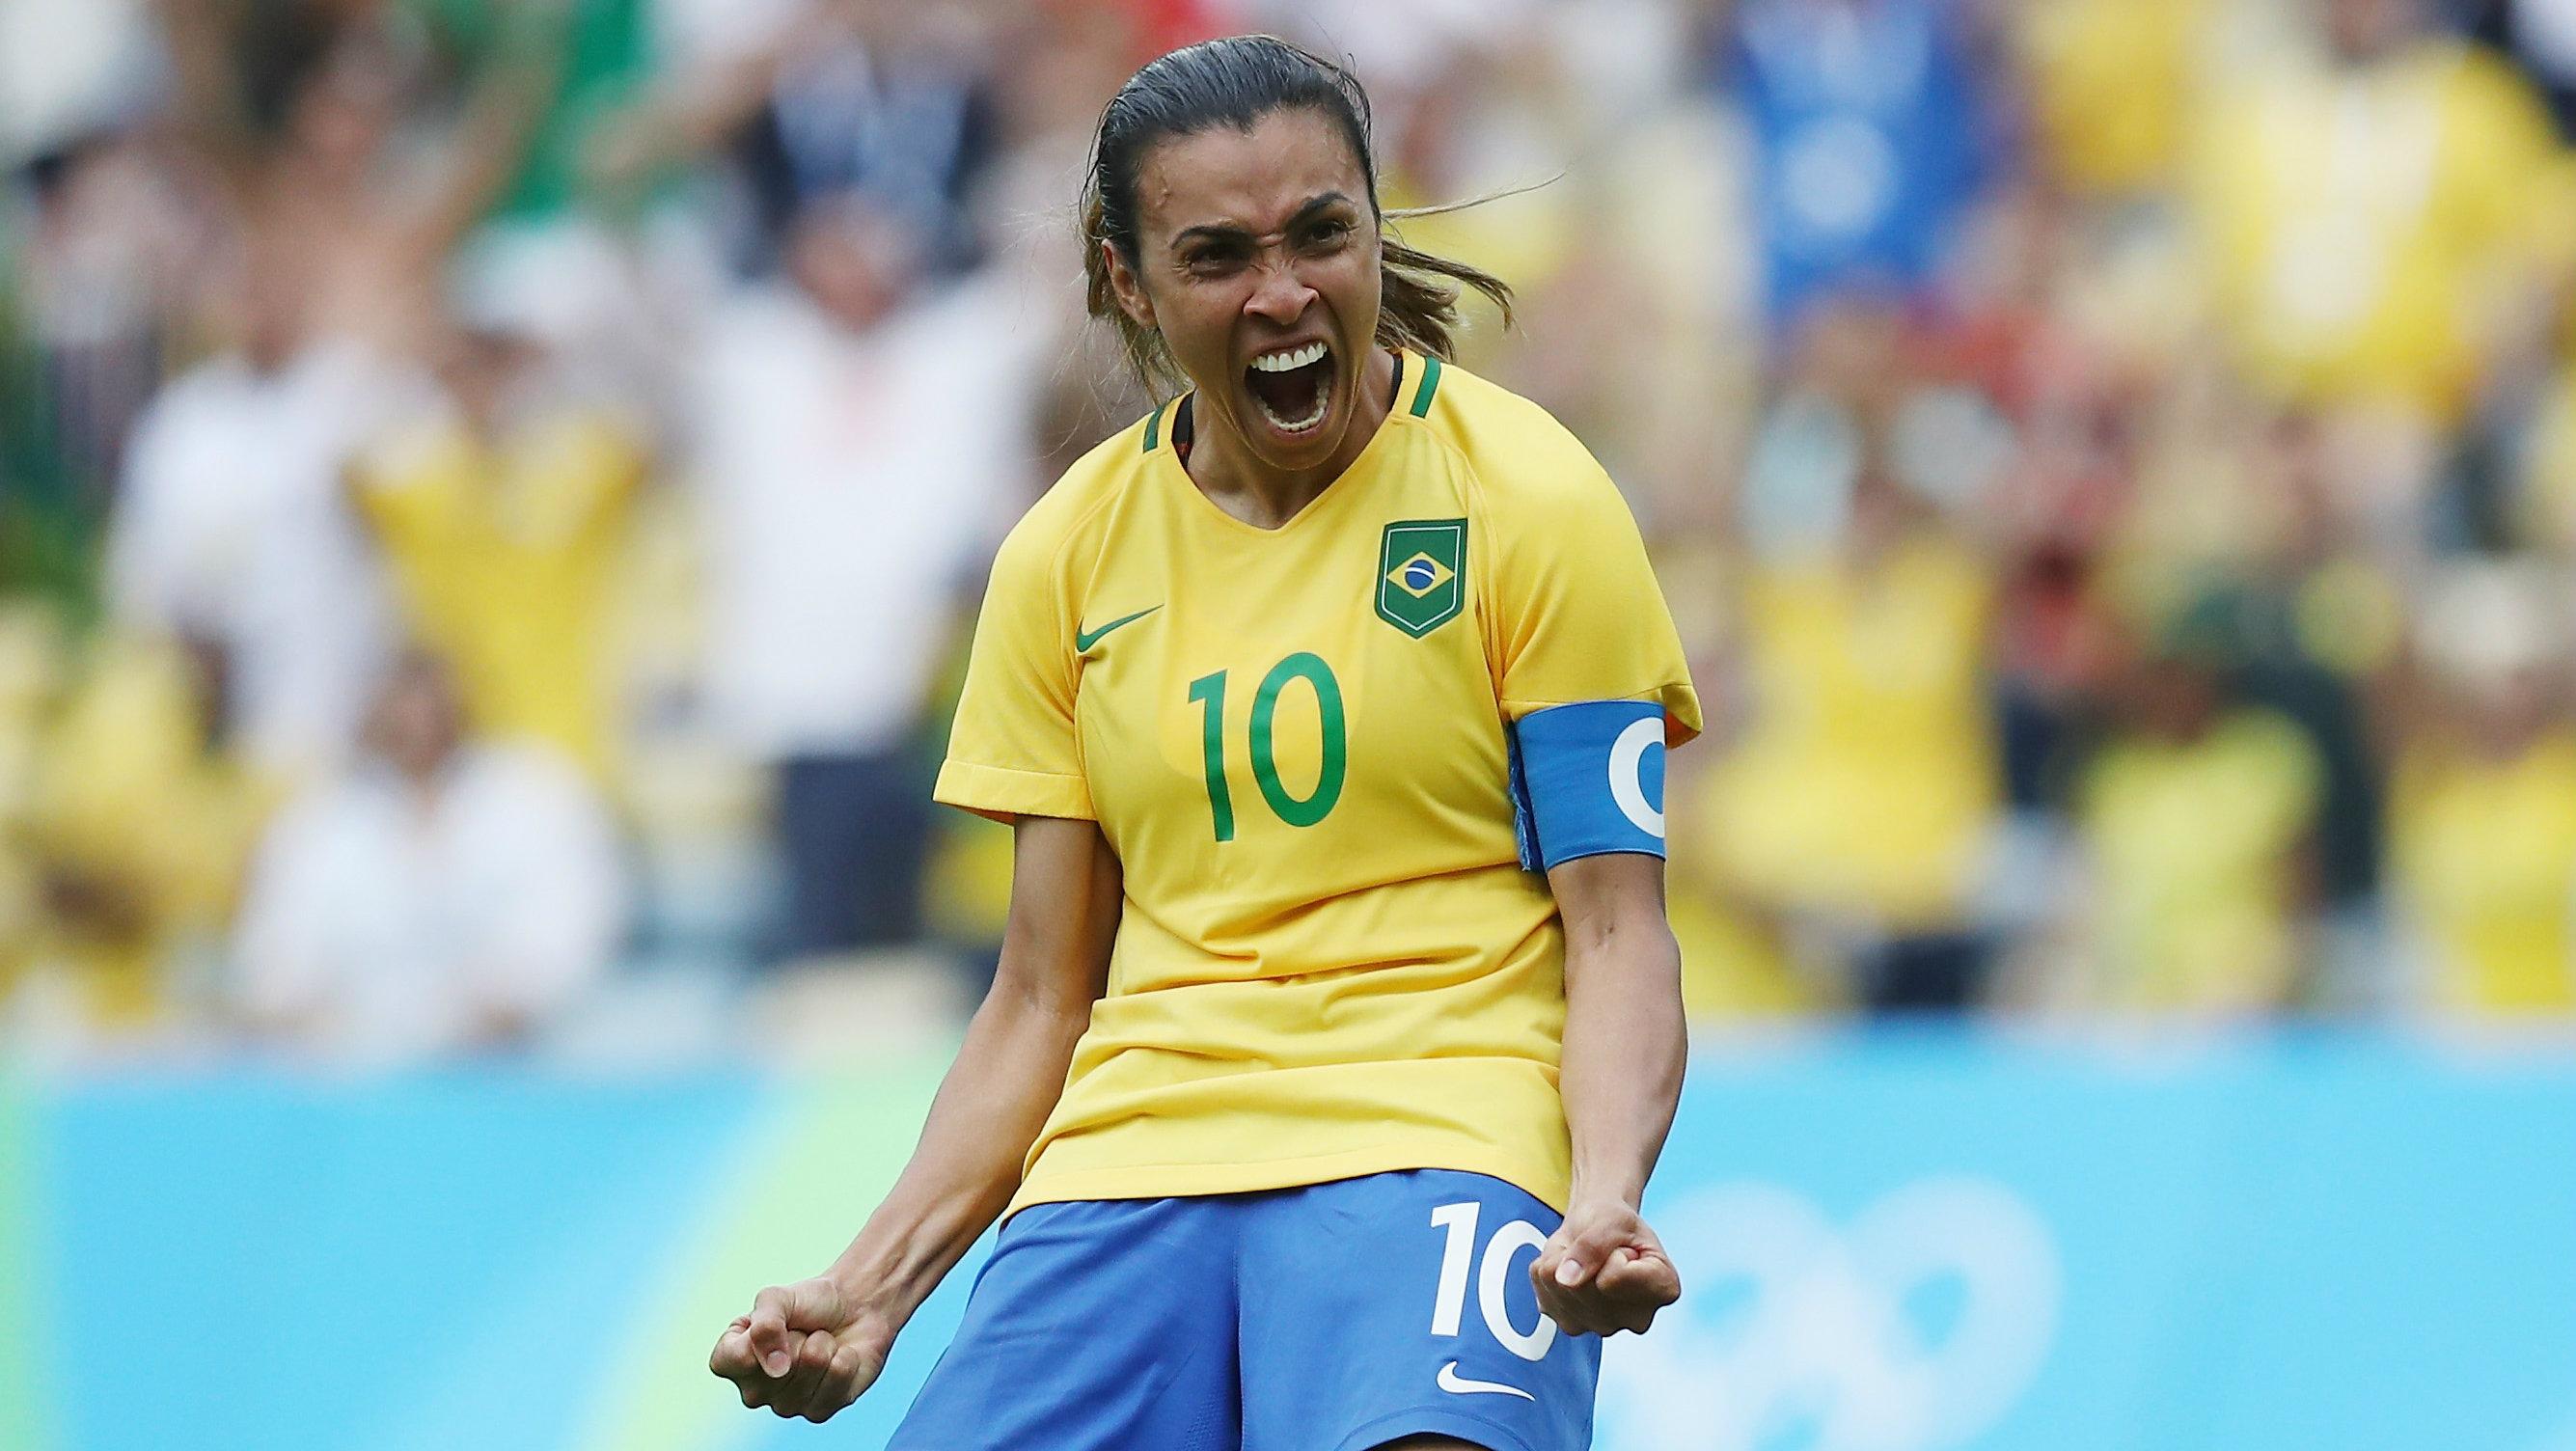 Brazilian superstar Marta has been named to face the Matildas next month in Australia.